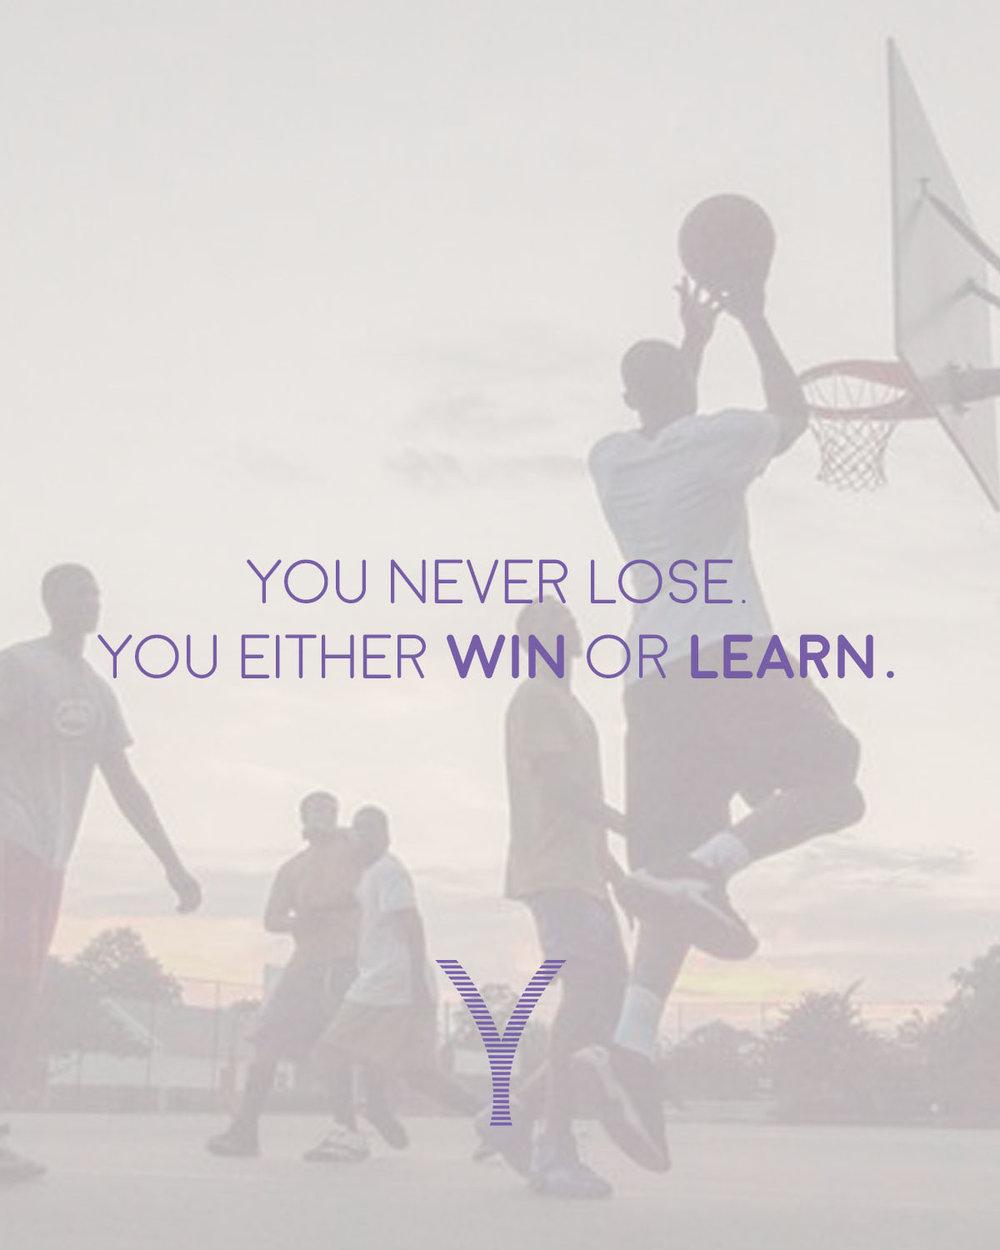 never lose.jpg